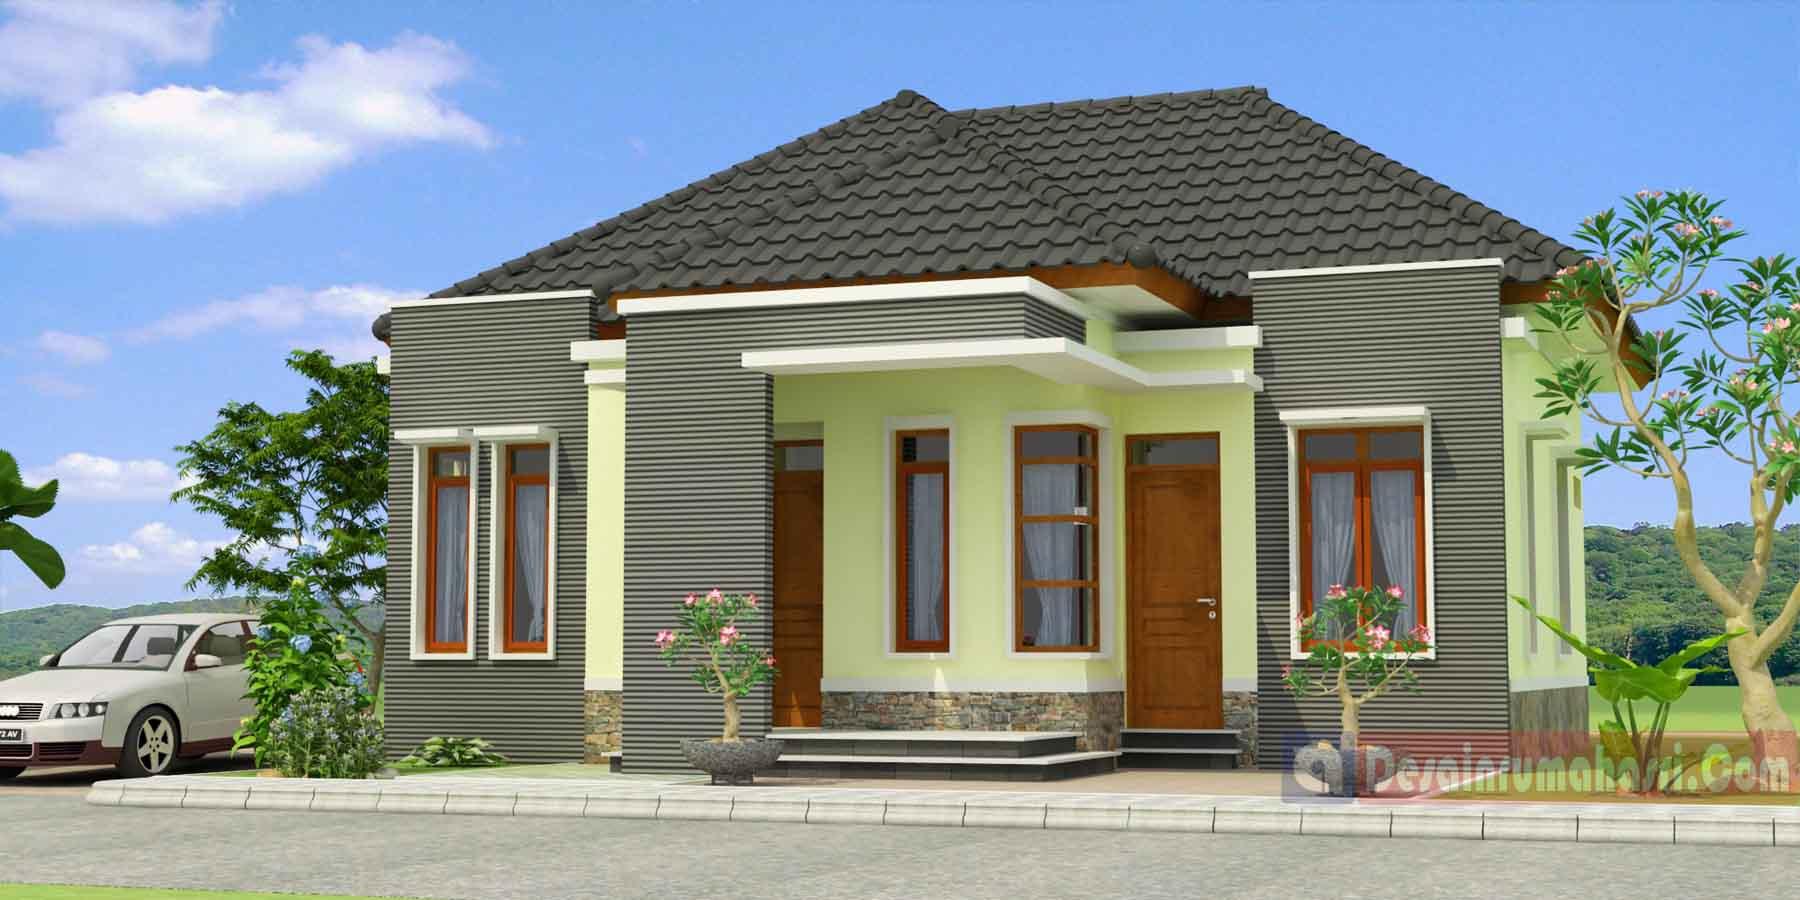 https://i1.wp.com/desainrumahasri.com/wp-content/uploads/2012/05/Rumah-Indah-1.jpg